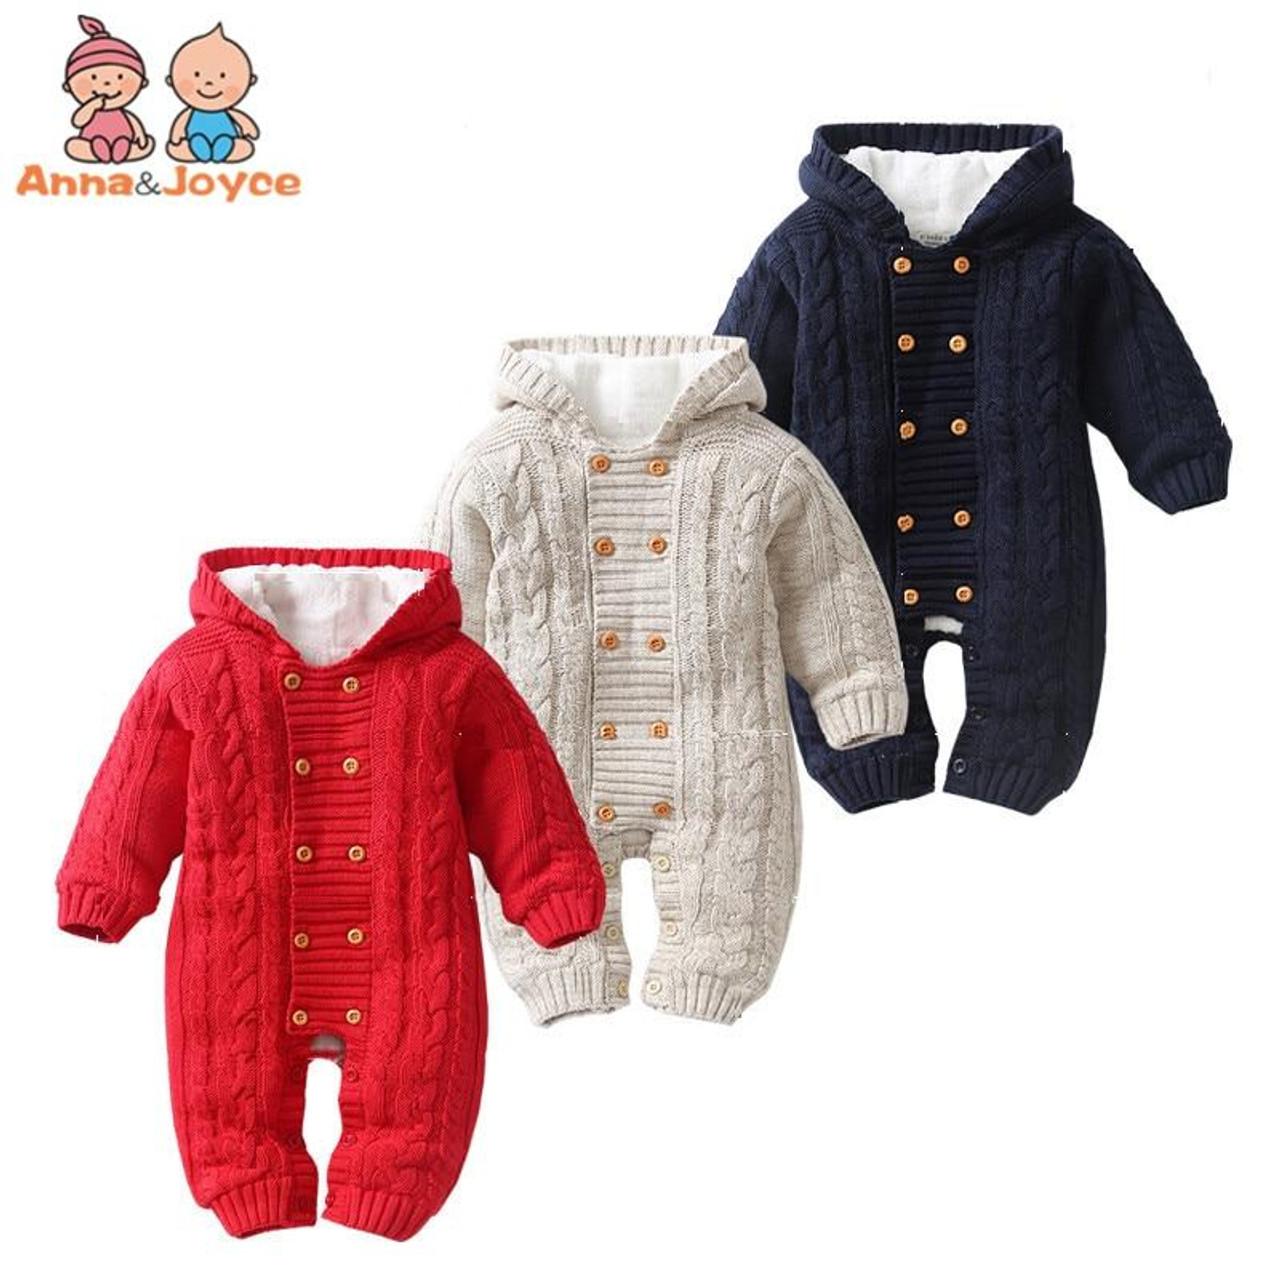 Newborn Baby Girl Boy Winter Jacket Sweater Warm Coat Knit Outwear Shorts Outfit